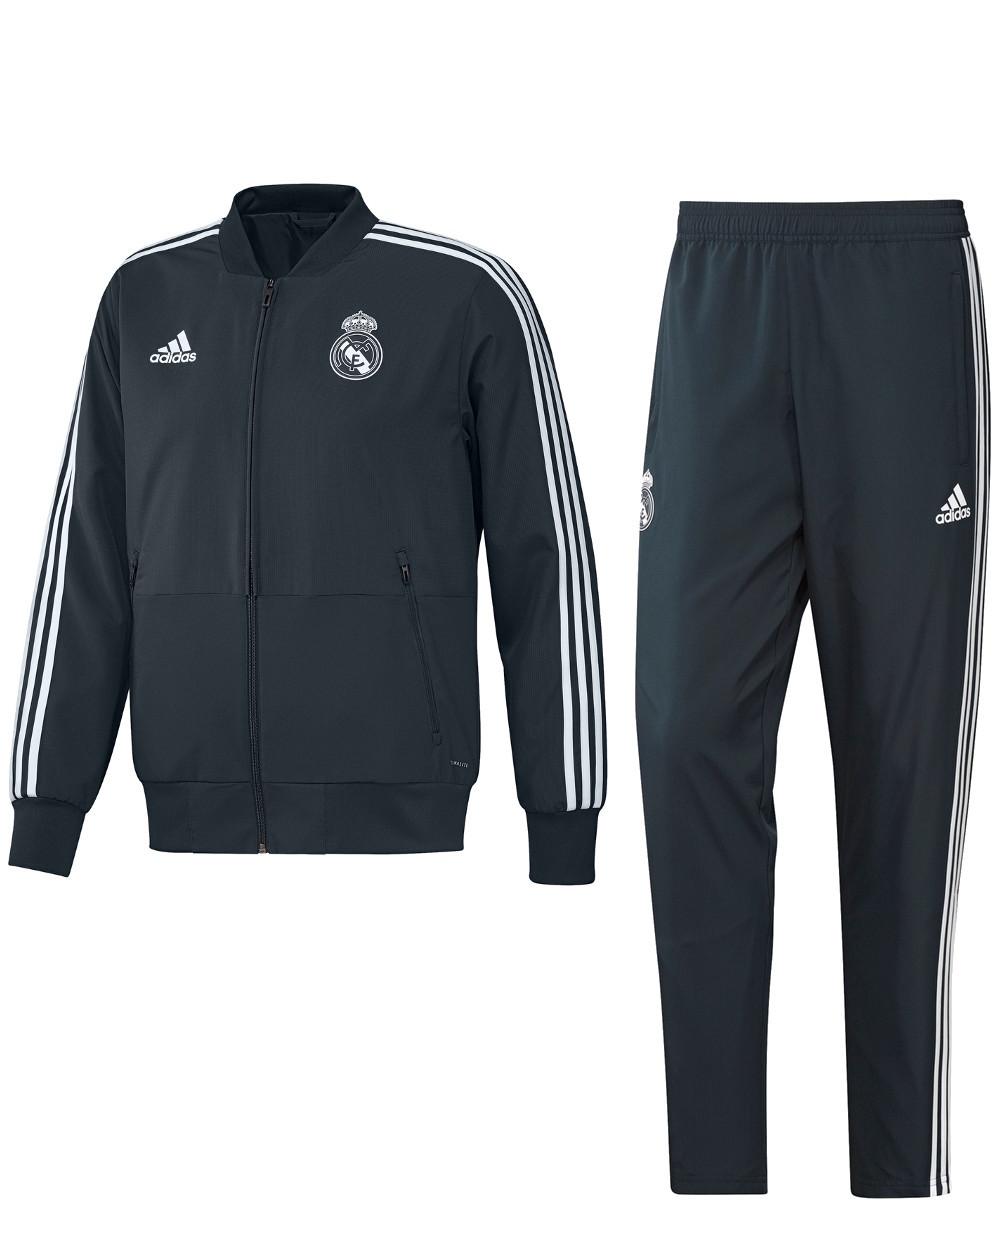 873bdd0421c3a Real Madrid Adidas Presentation Tracksuit 2018 19 Woven Navy